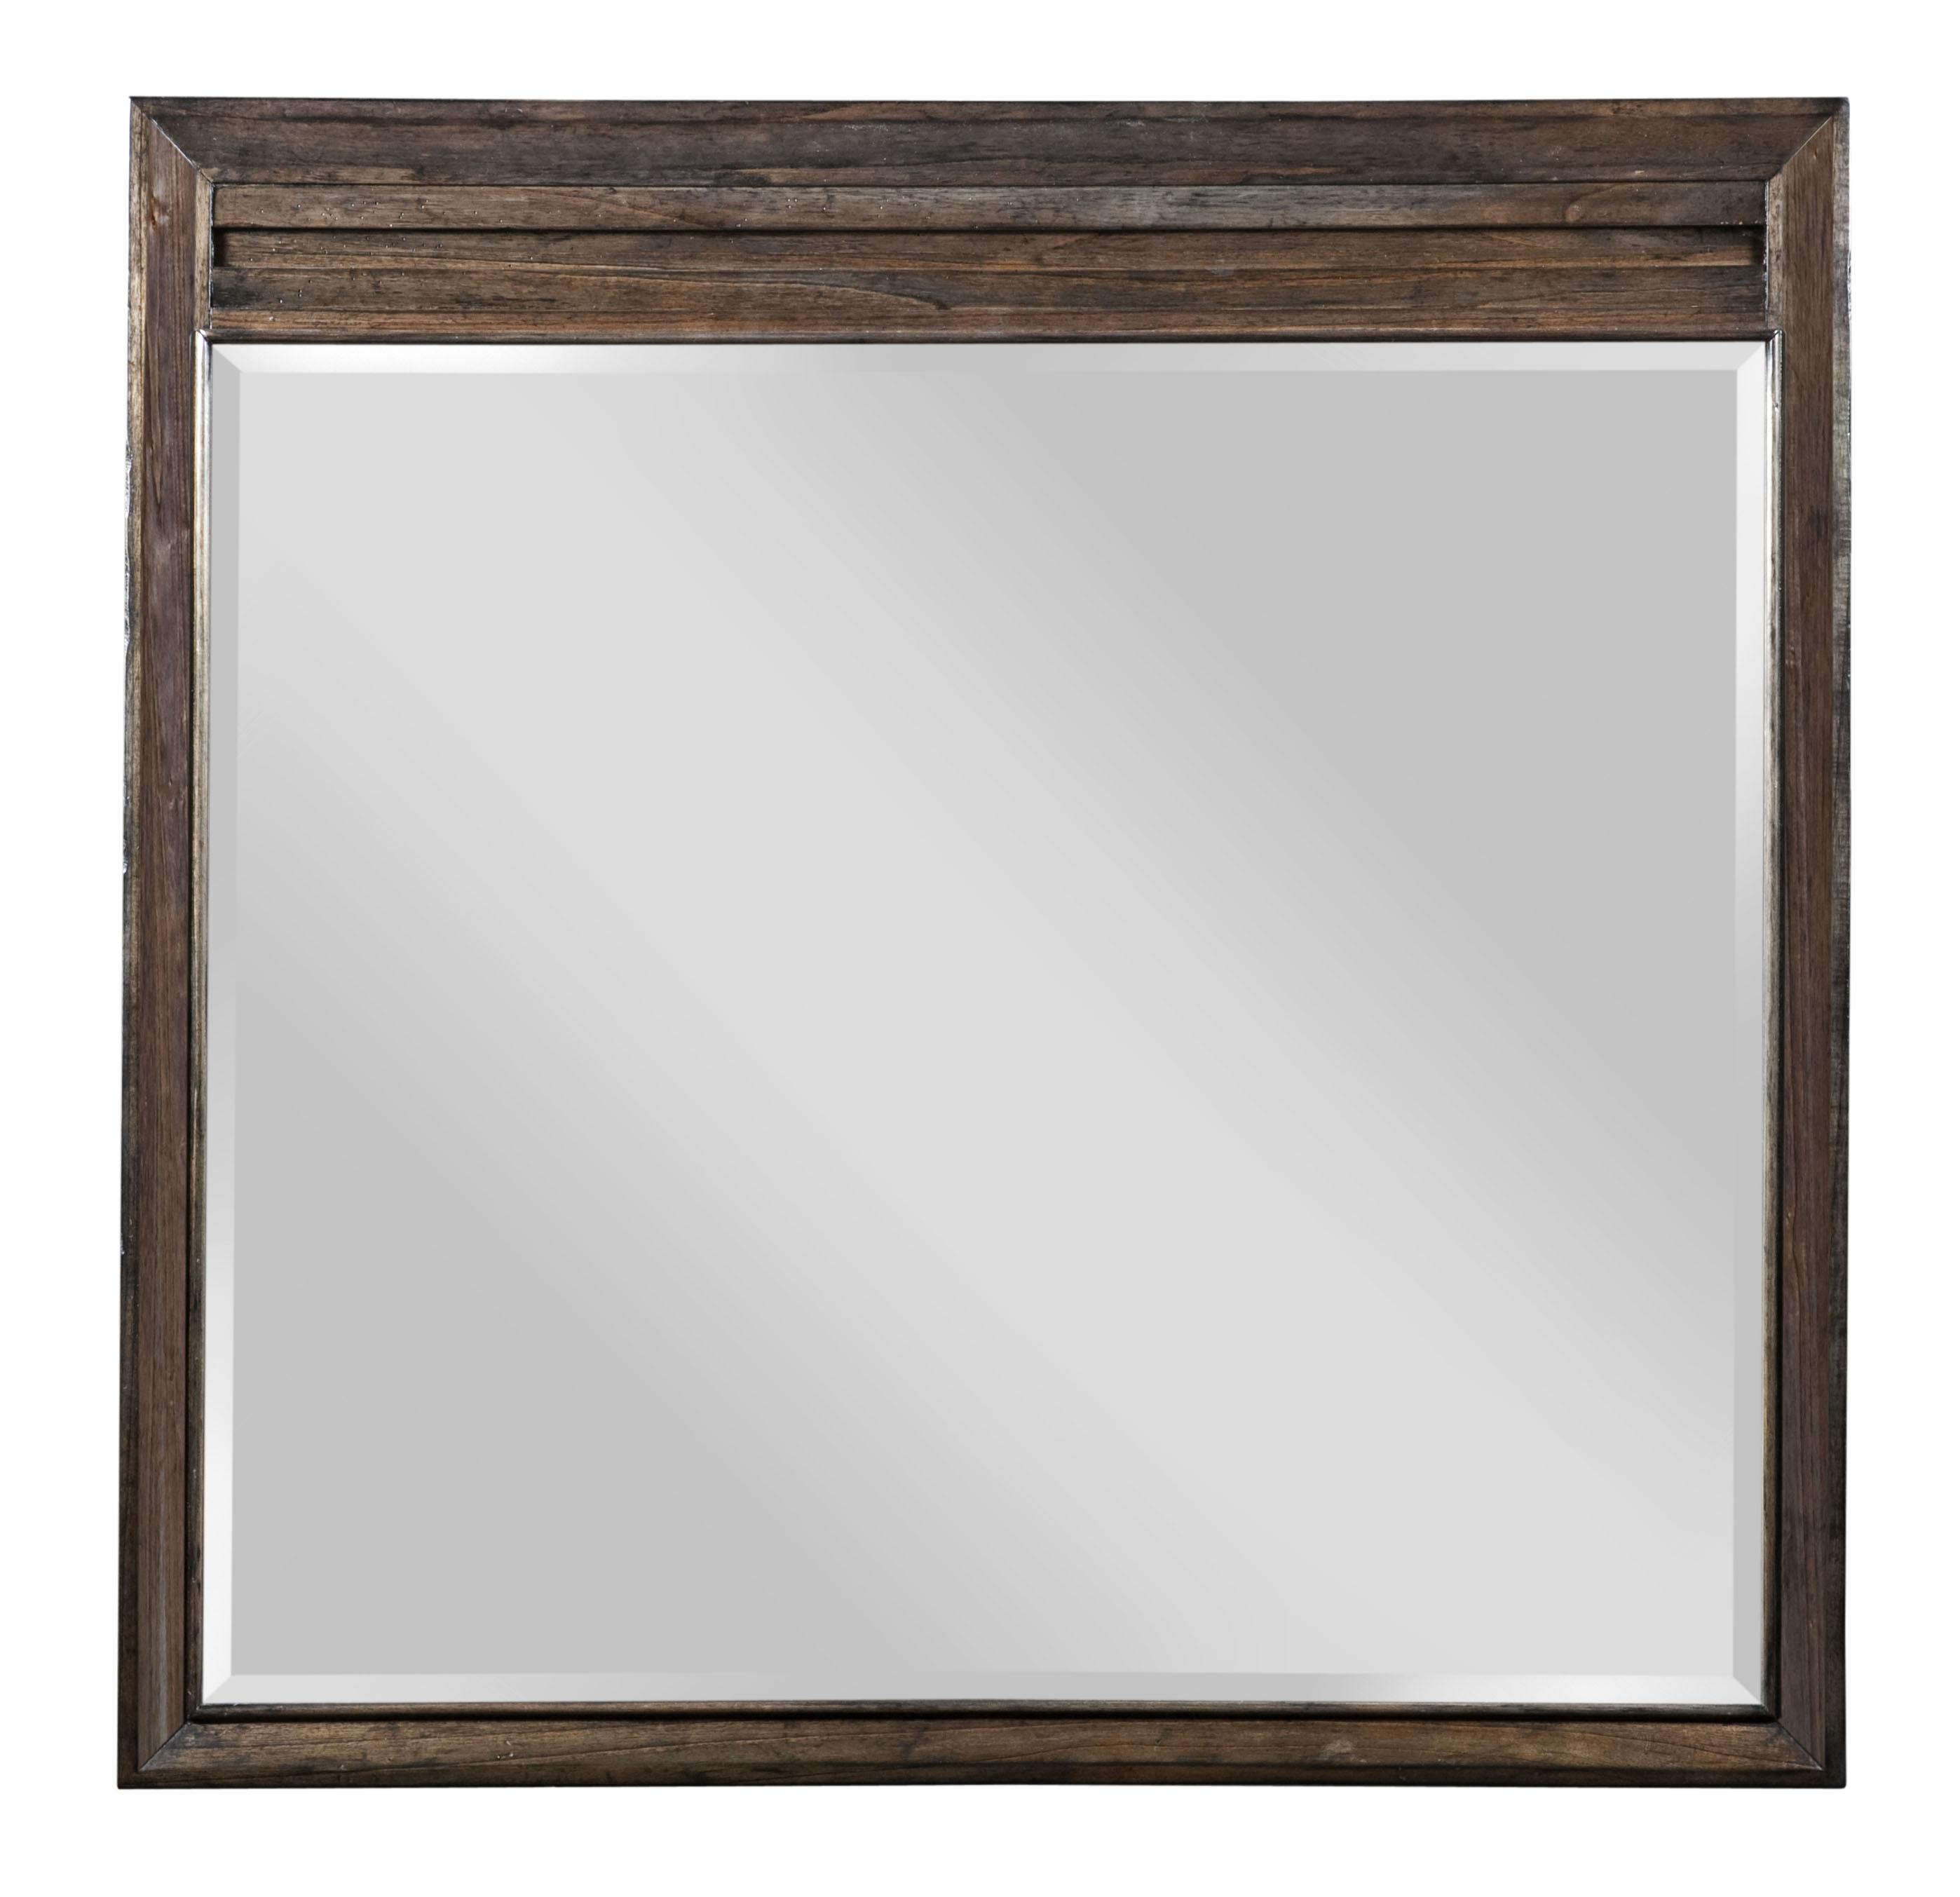 Kincaid Furniture Montreat Montreat Mirror - Item Number: 84-114